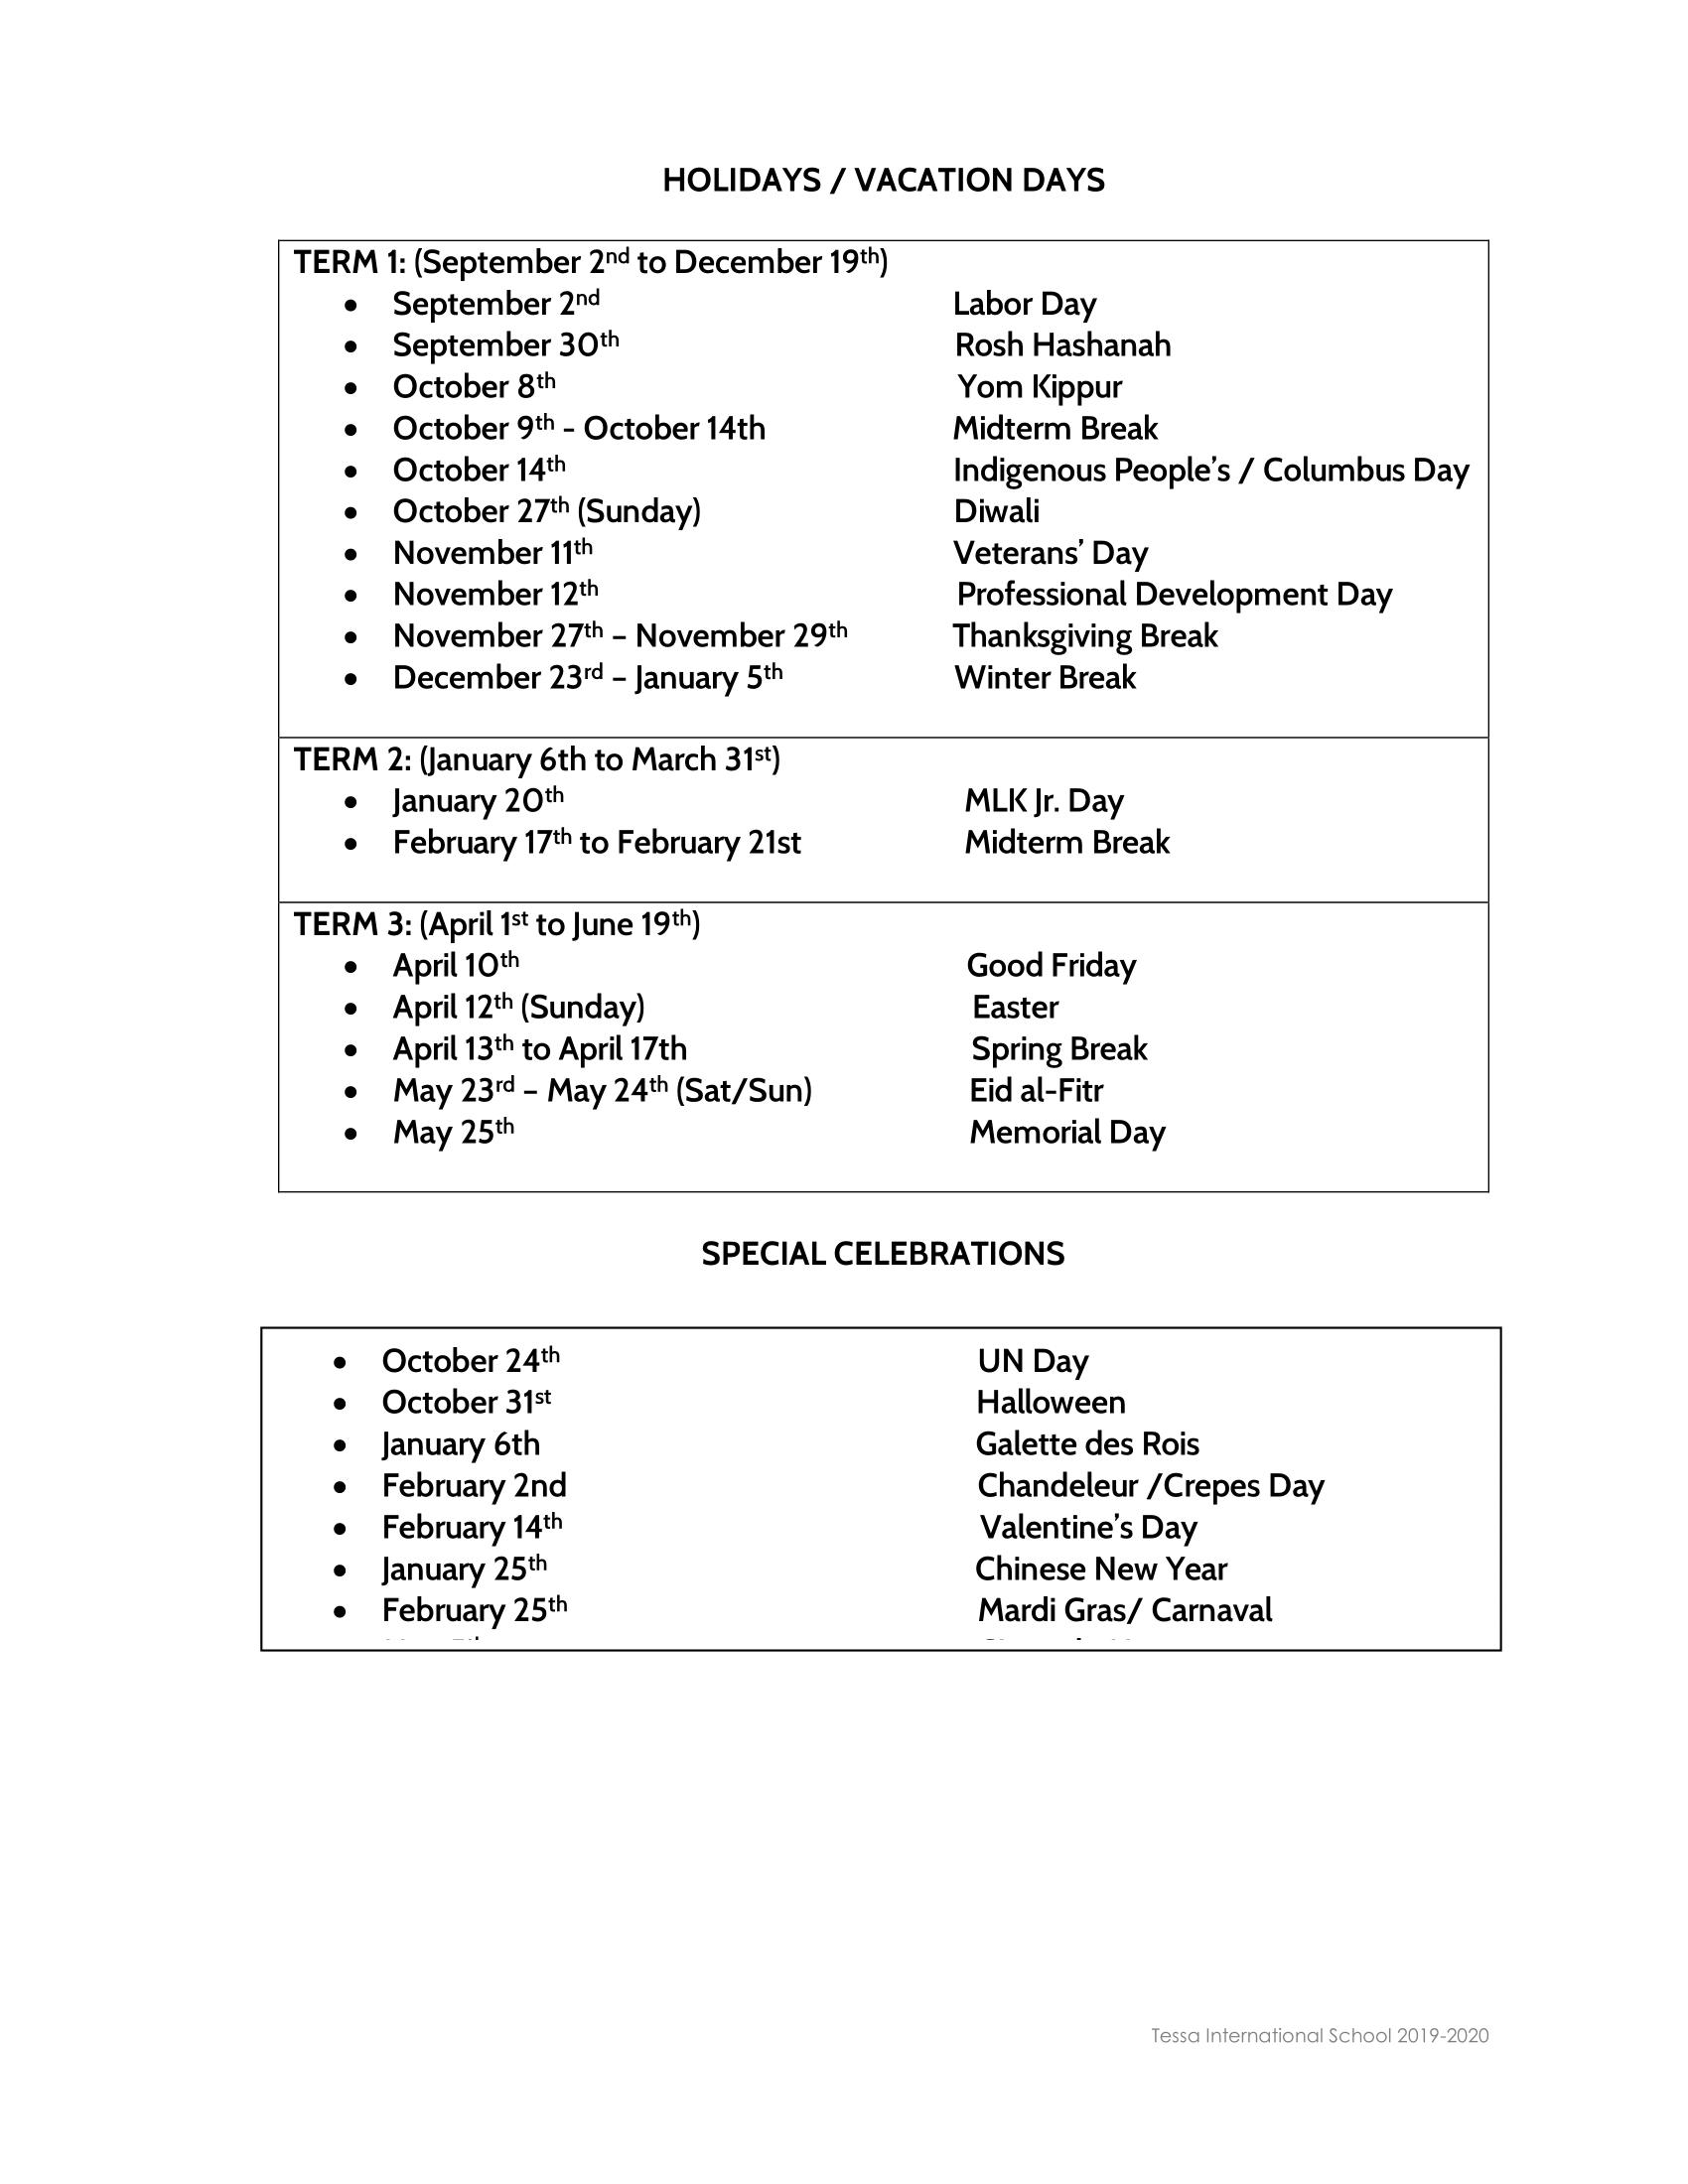 Calendar 2019-2020 - Tessa International School within 2020 Special Days